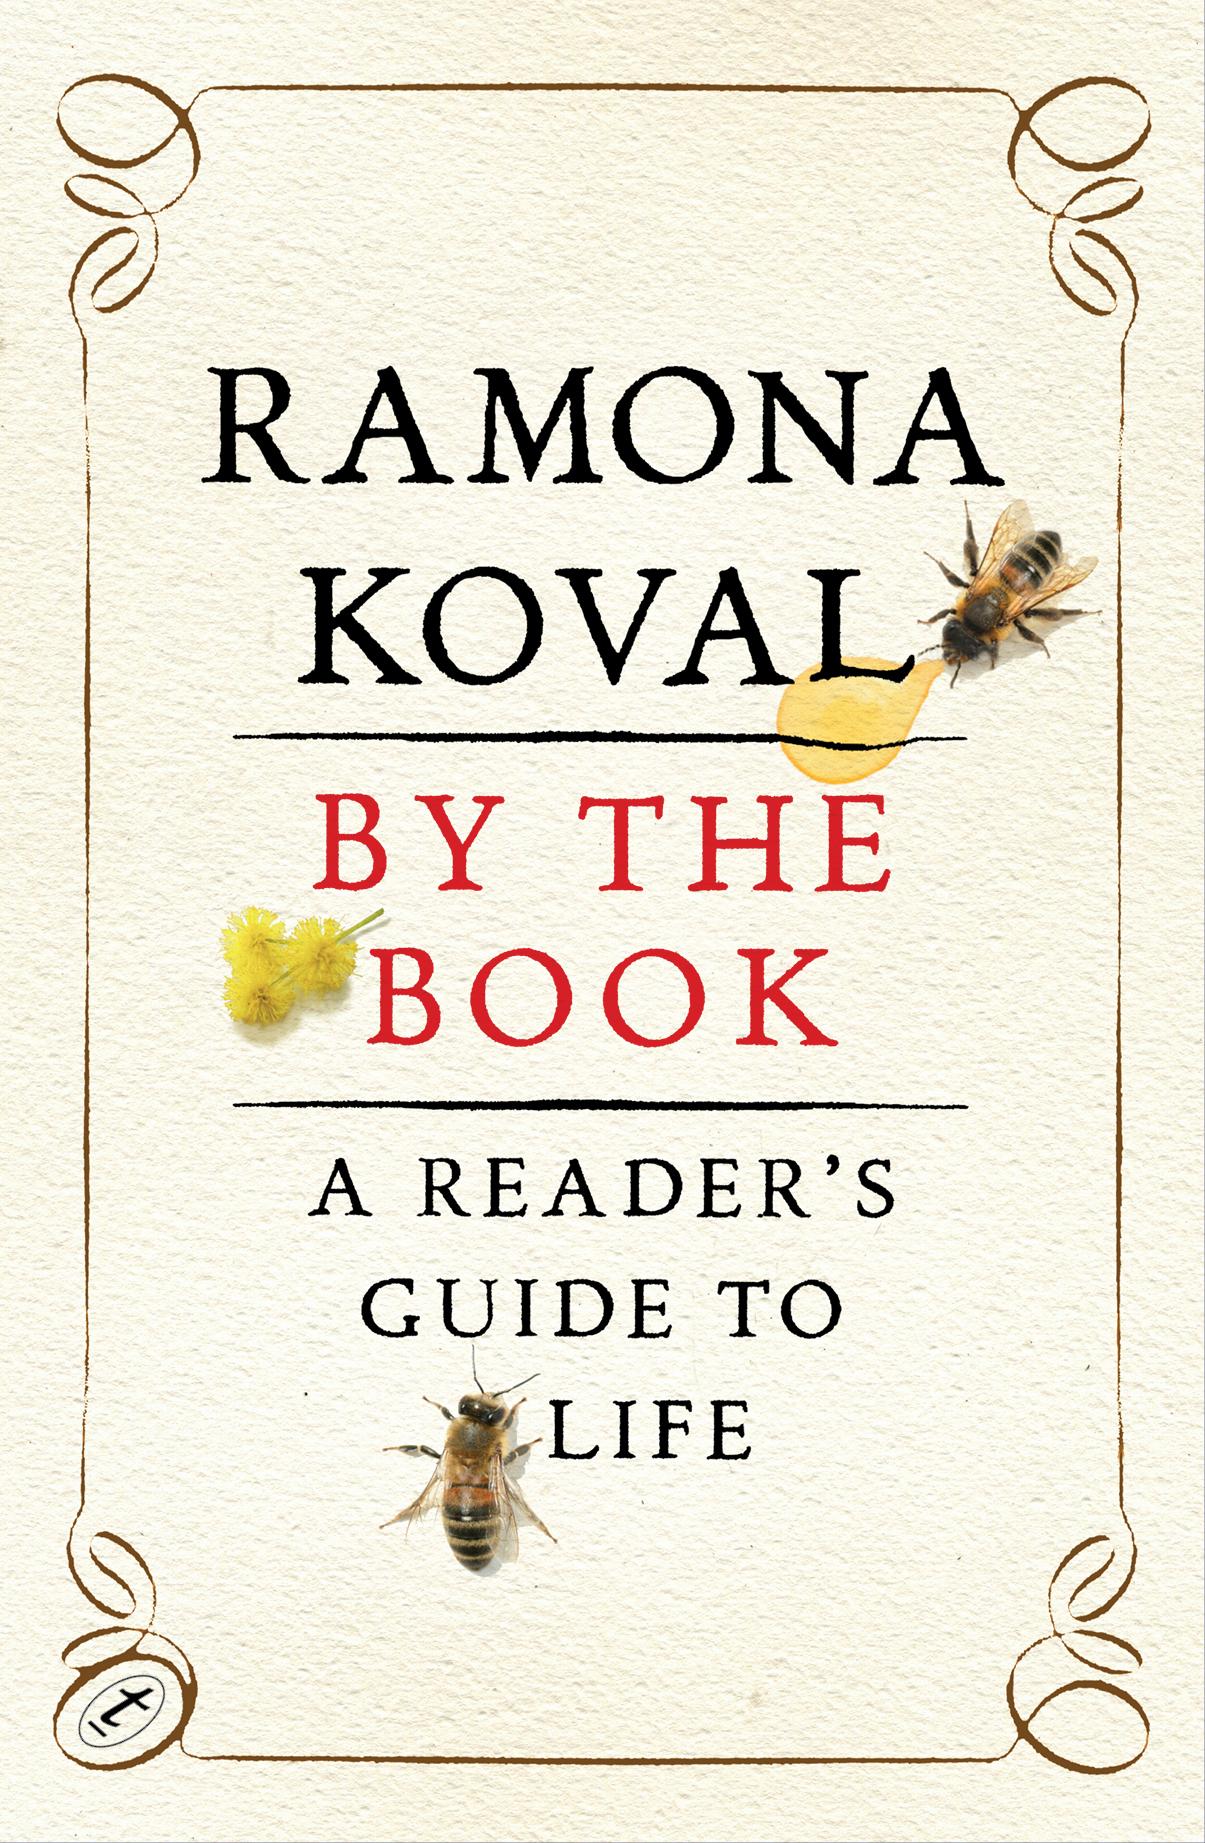 Ramona Koval